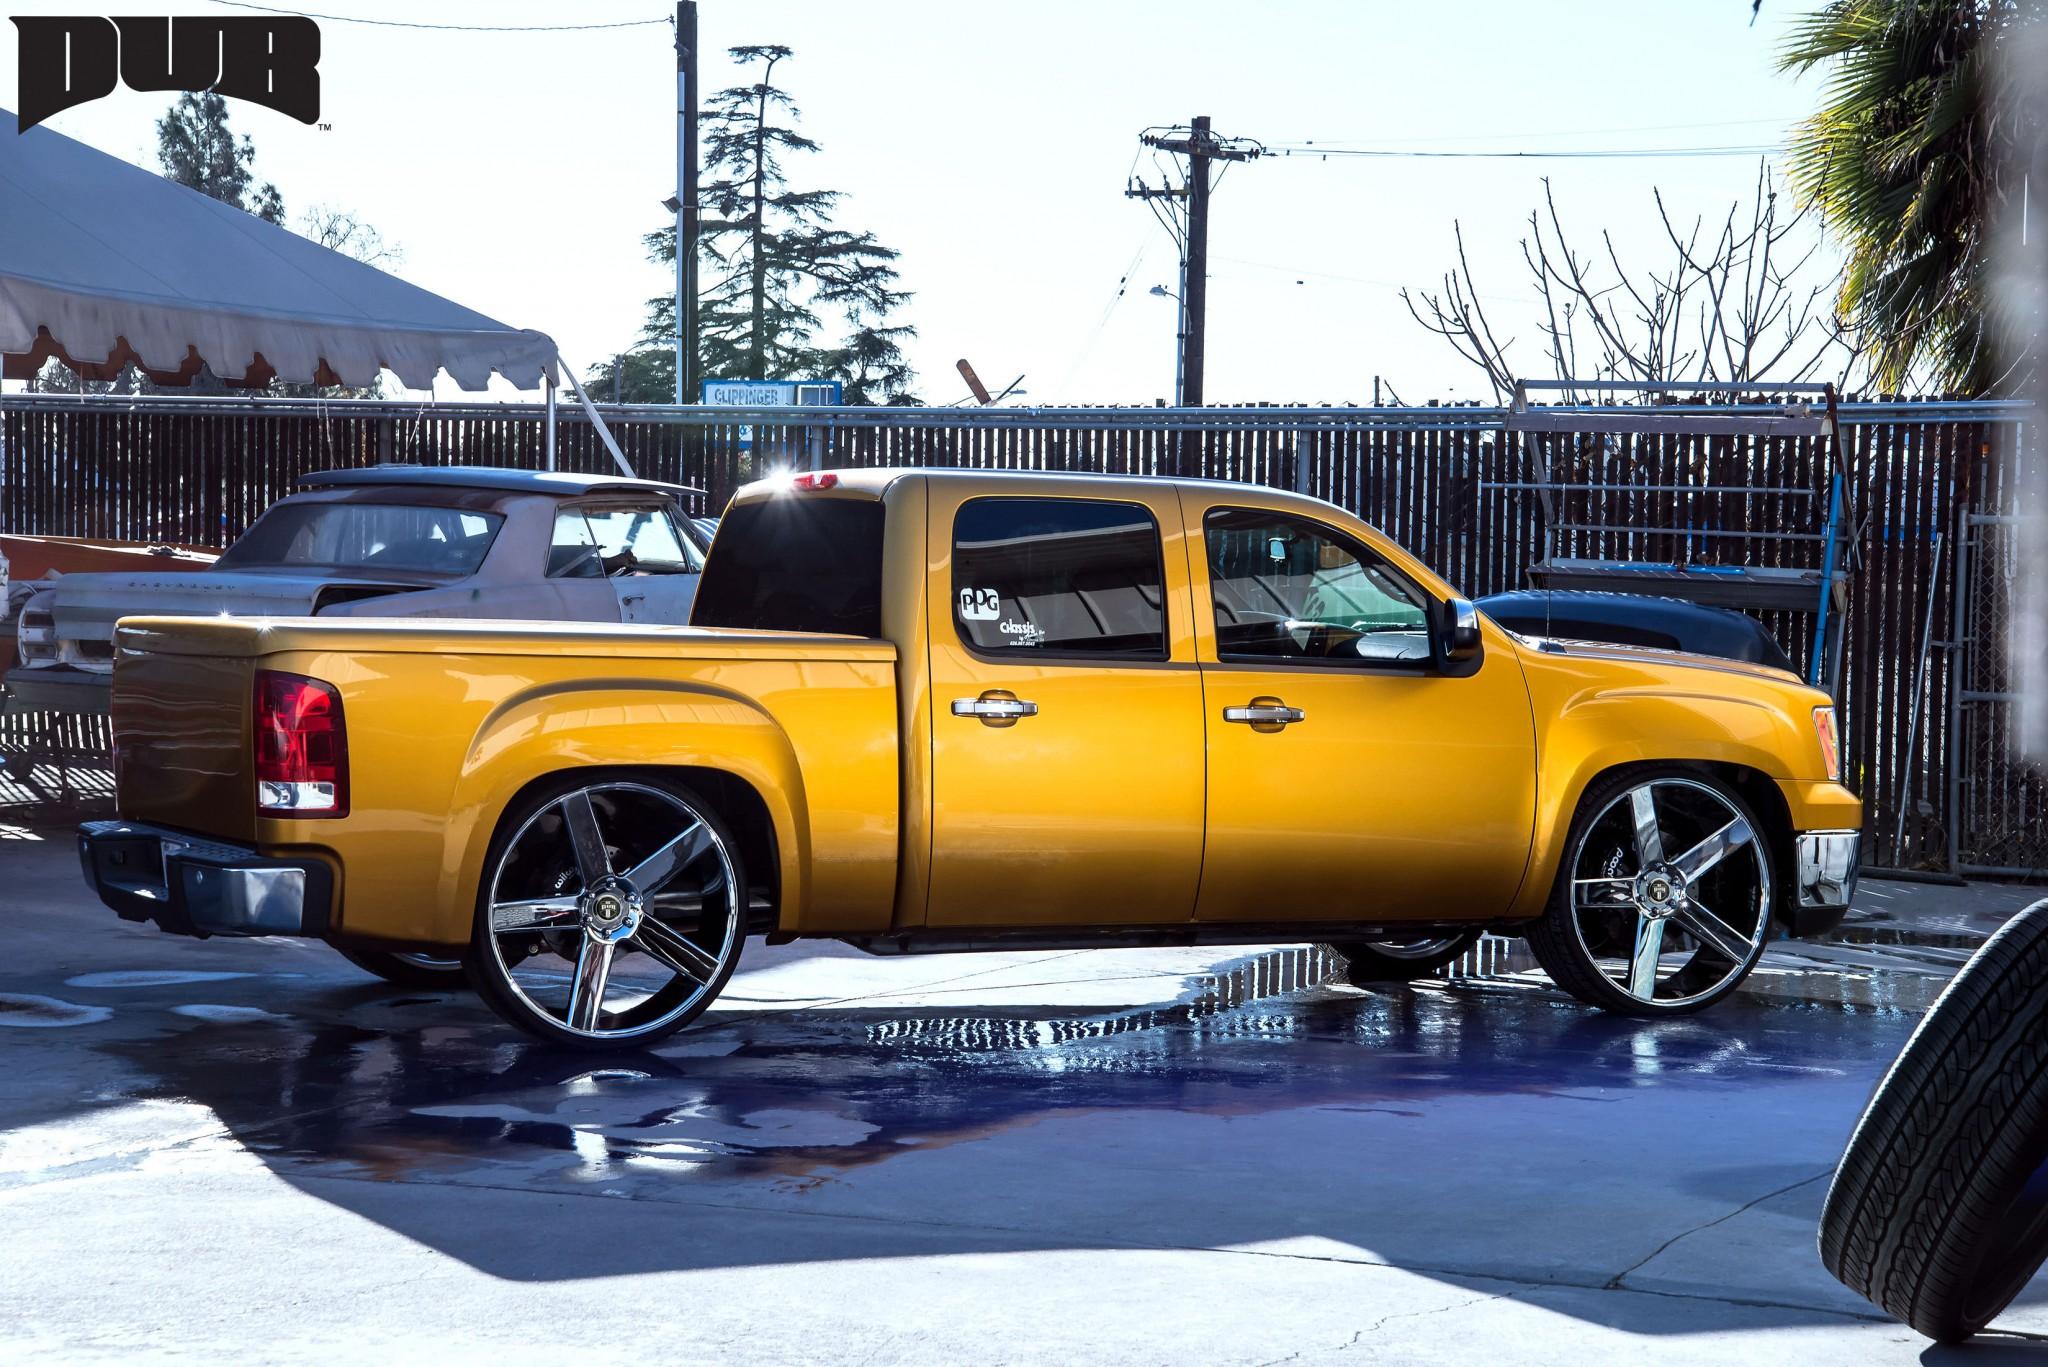 30 Inch Rims On Chevy : Inch rims on silverado car interior design